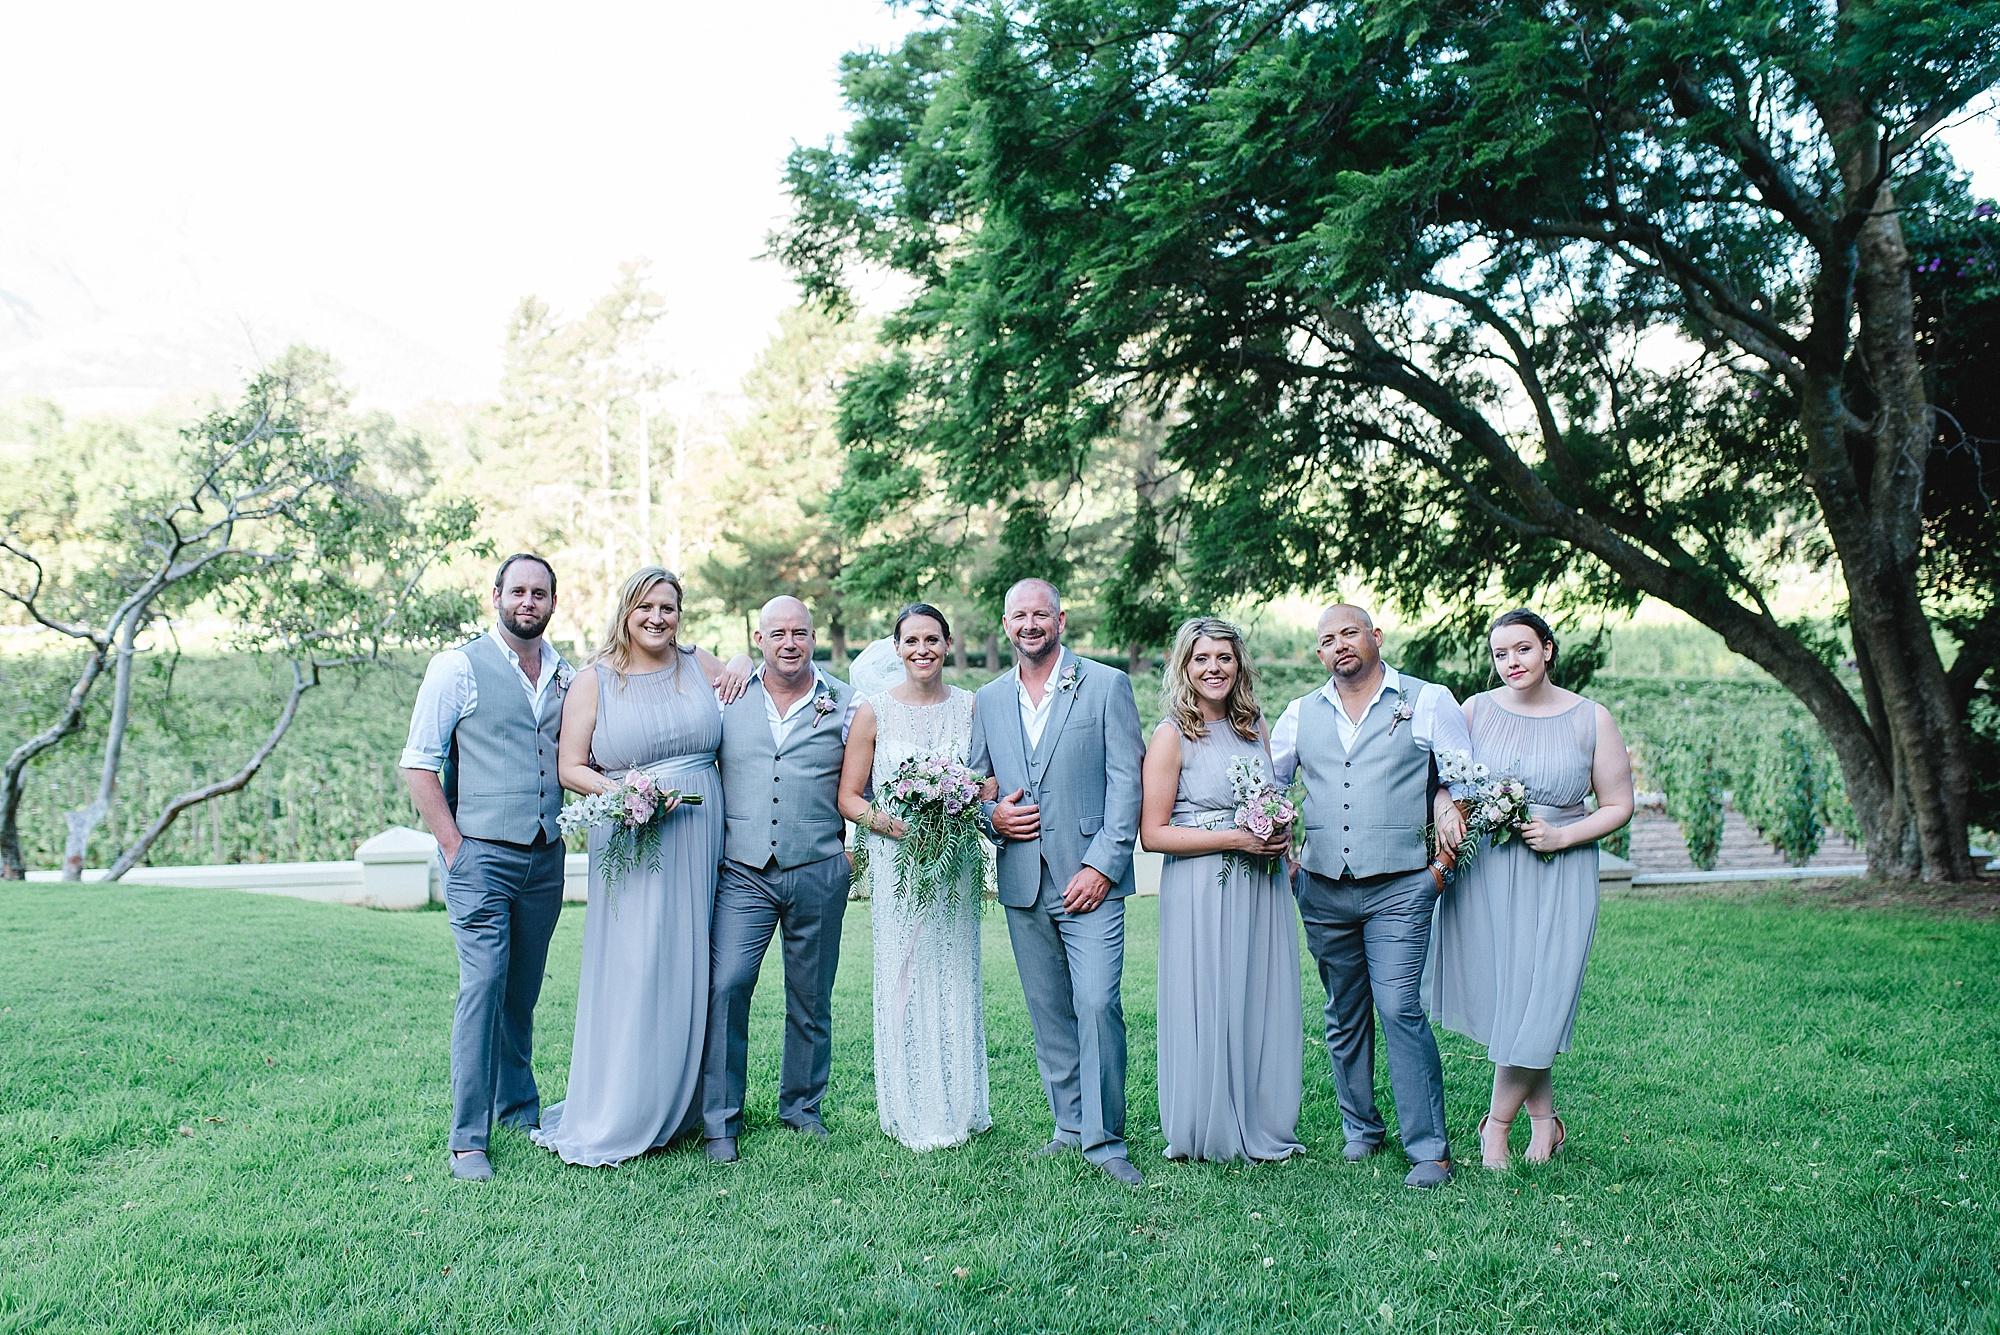 www.darrenbester.co_.za-Wedding-Photography-Family-Formal-Photographs_0004.jpg